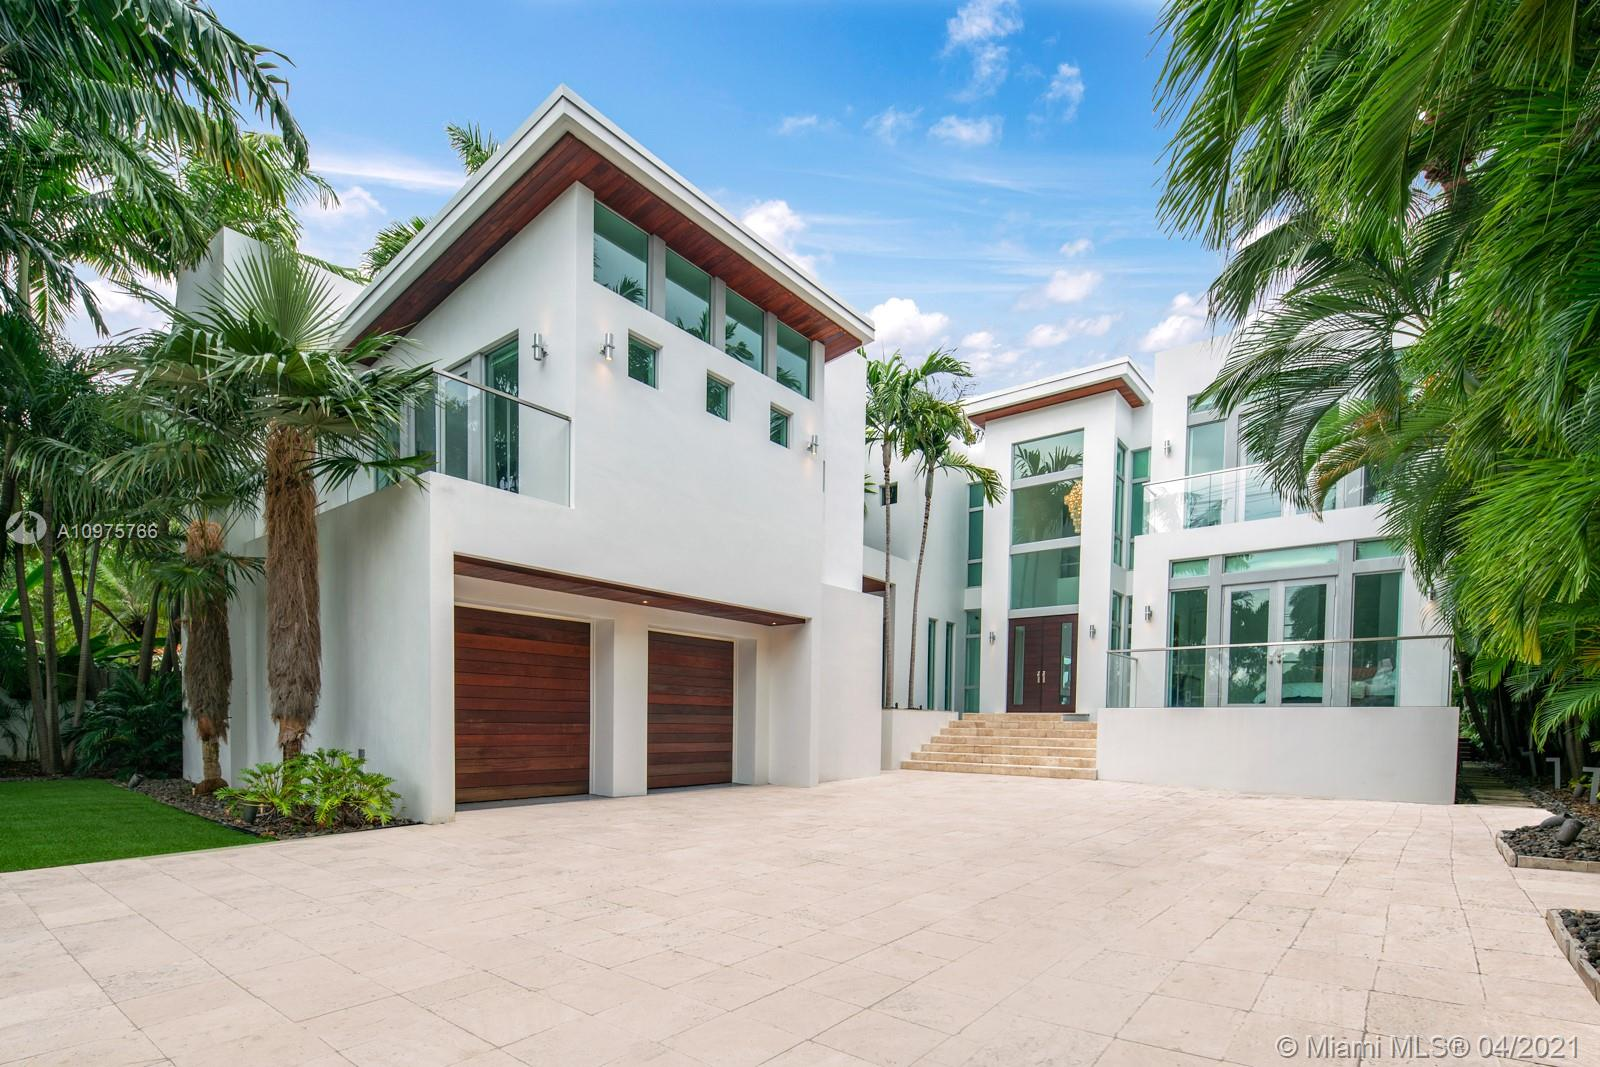 Venetian Islands - 1337 N Venetian Way, Miami, FL 33139